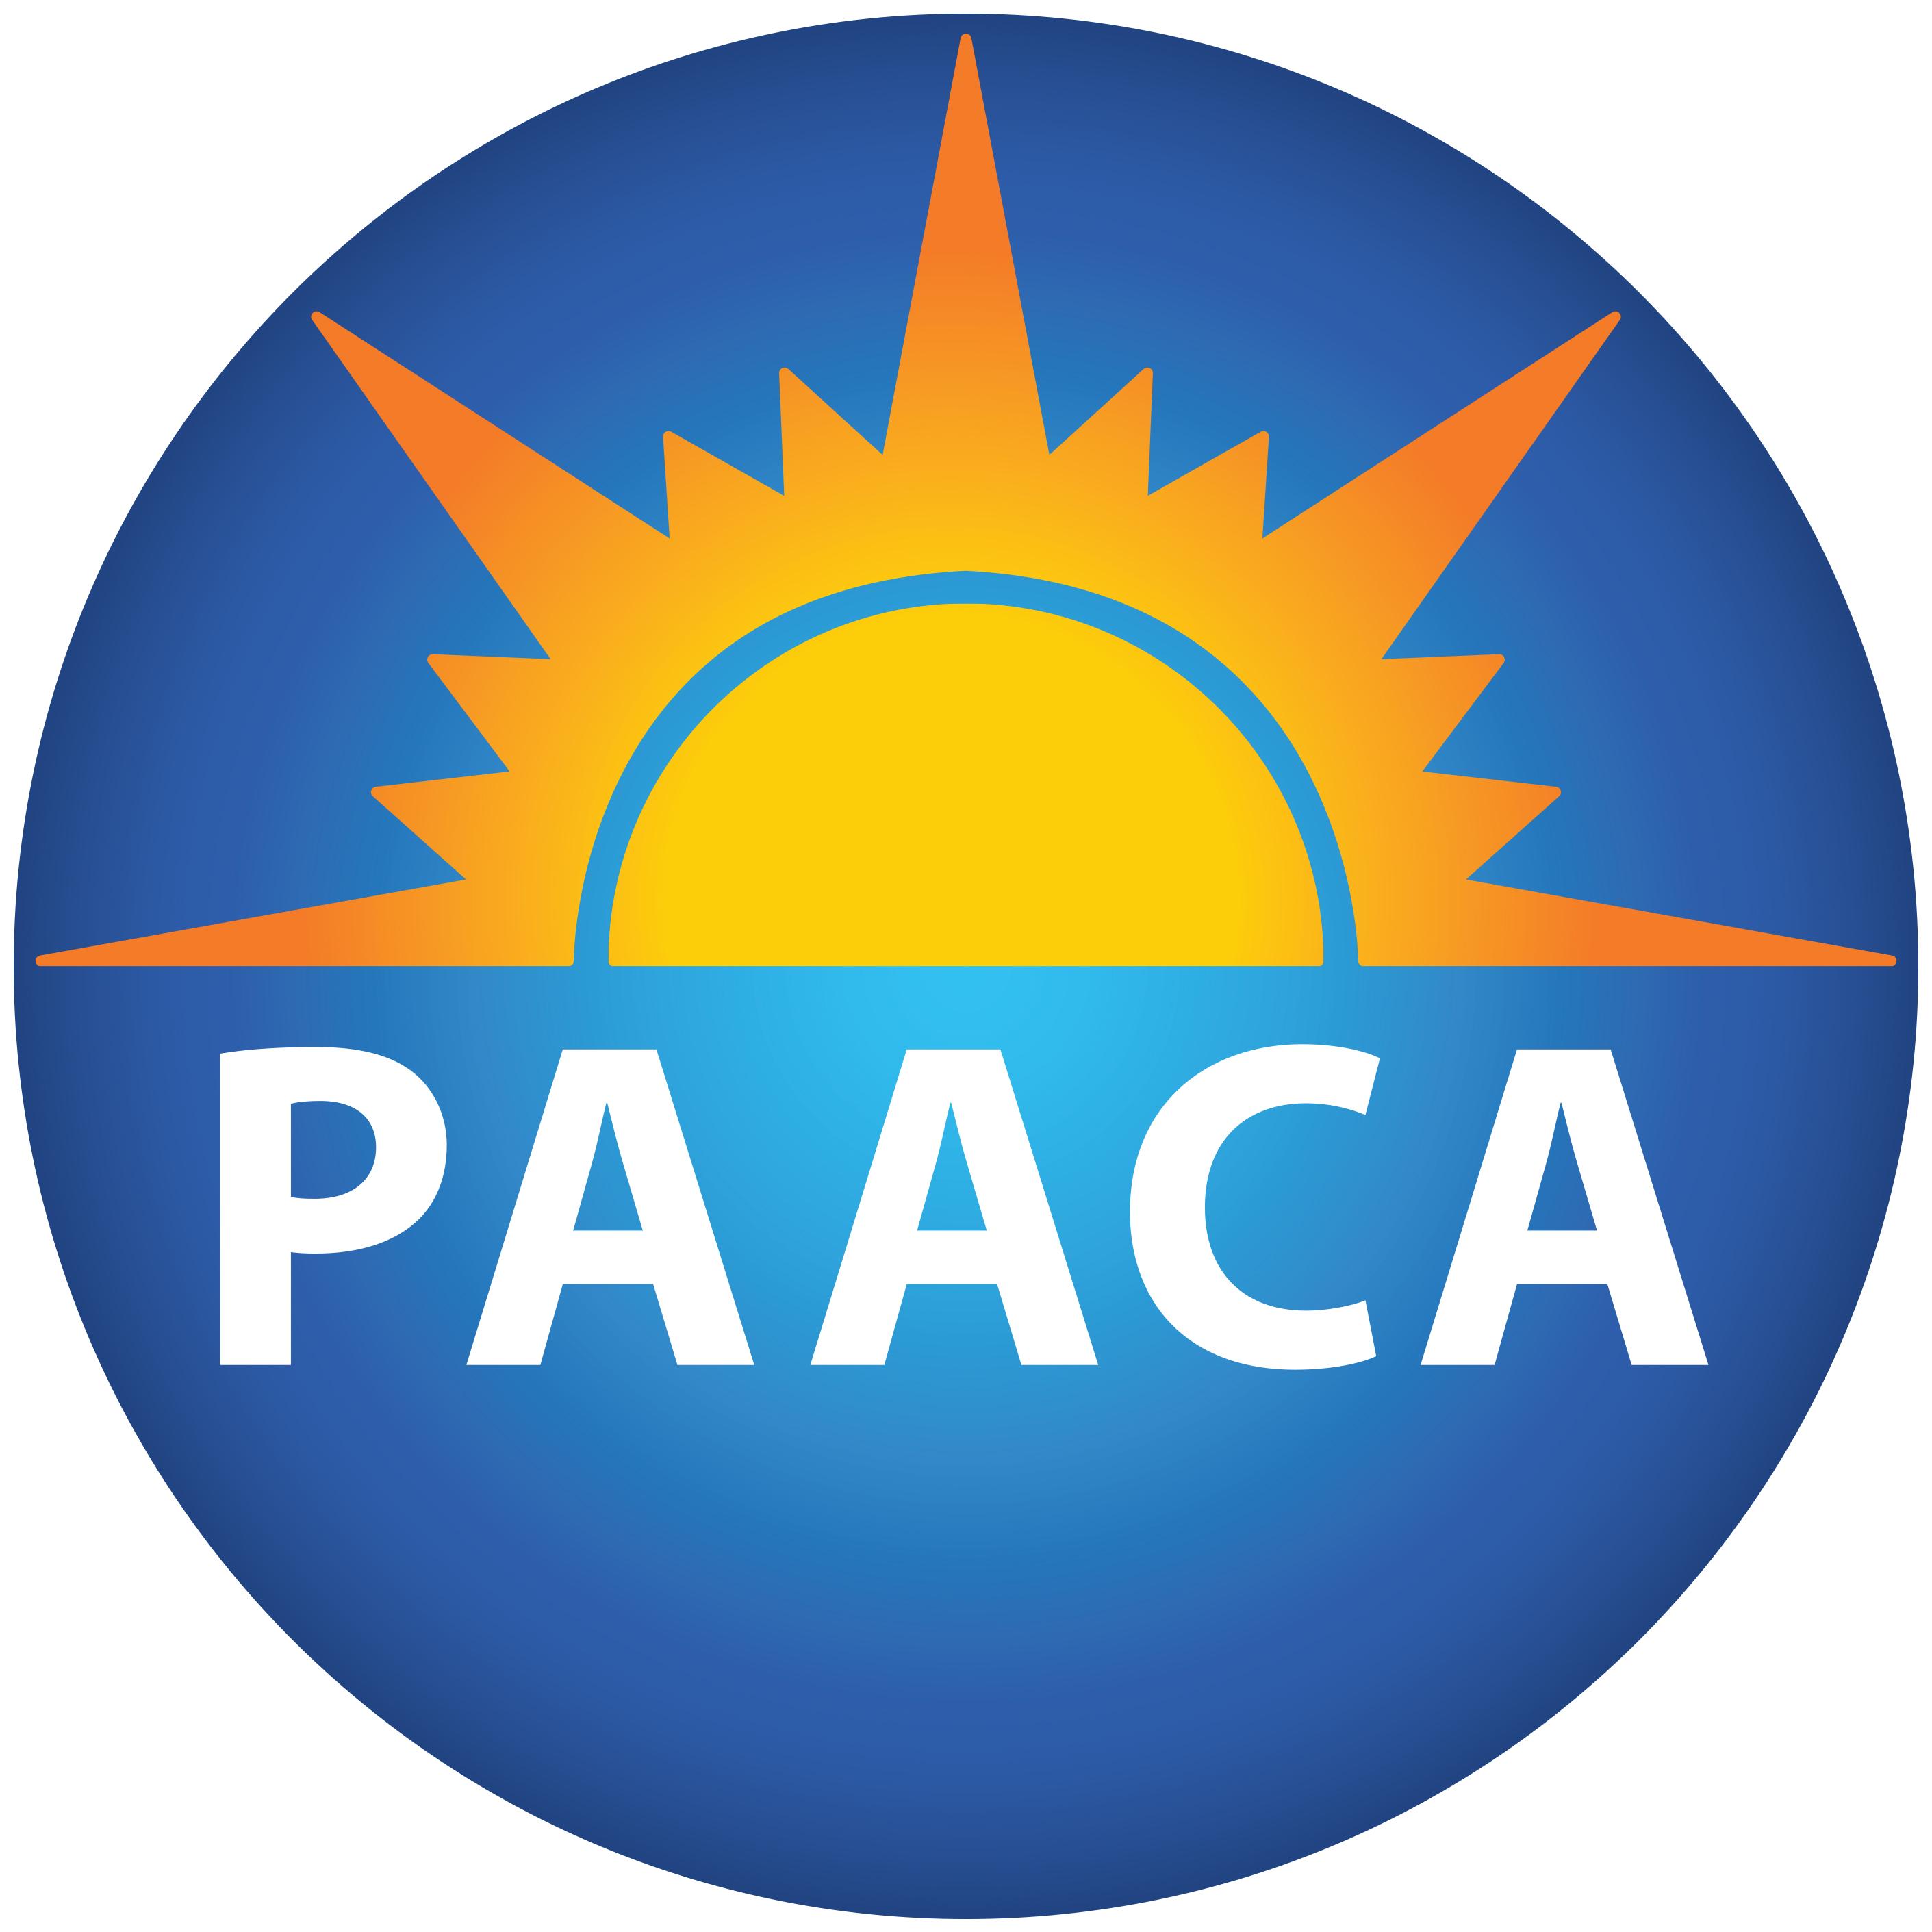 PAACA_logo.jpg